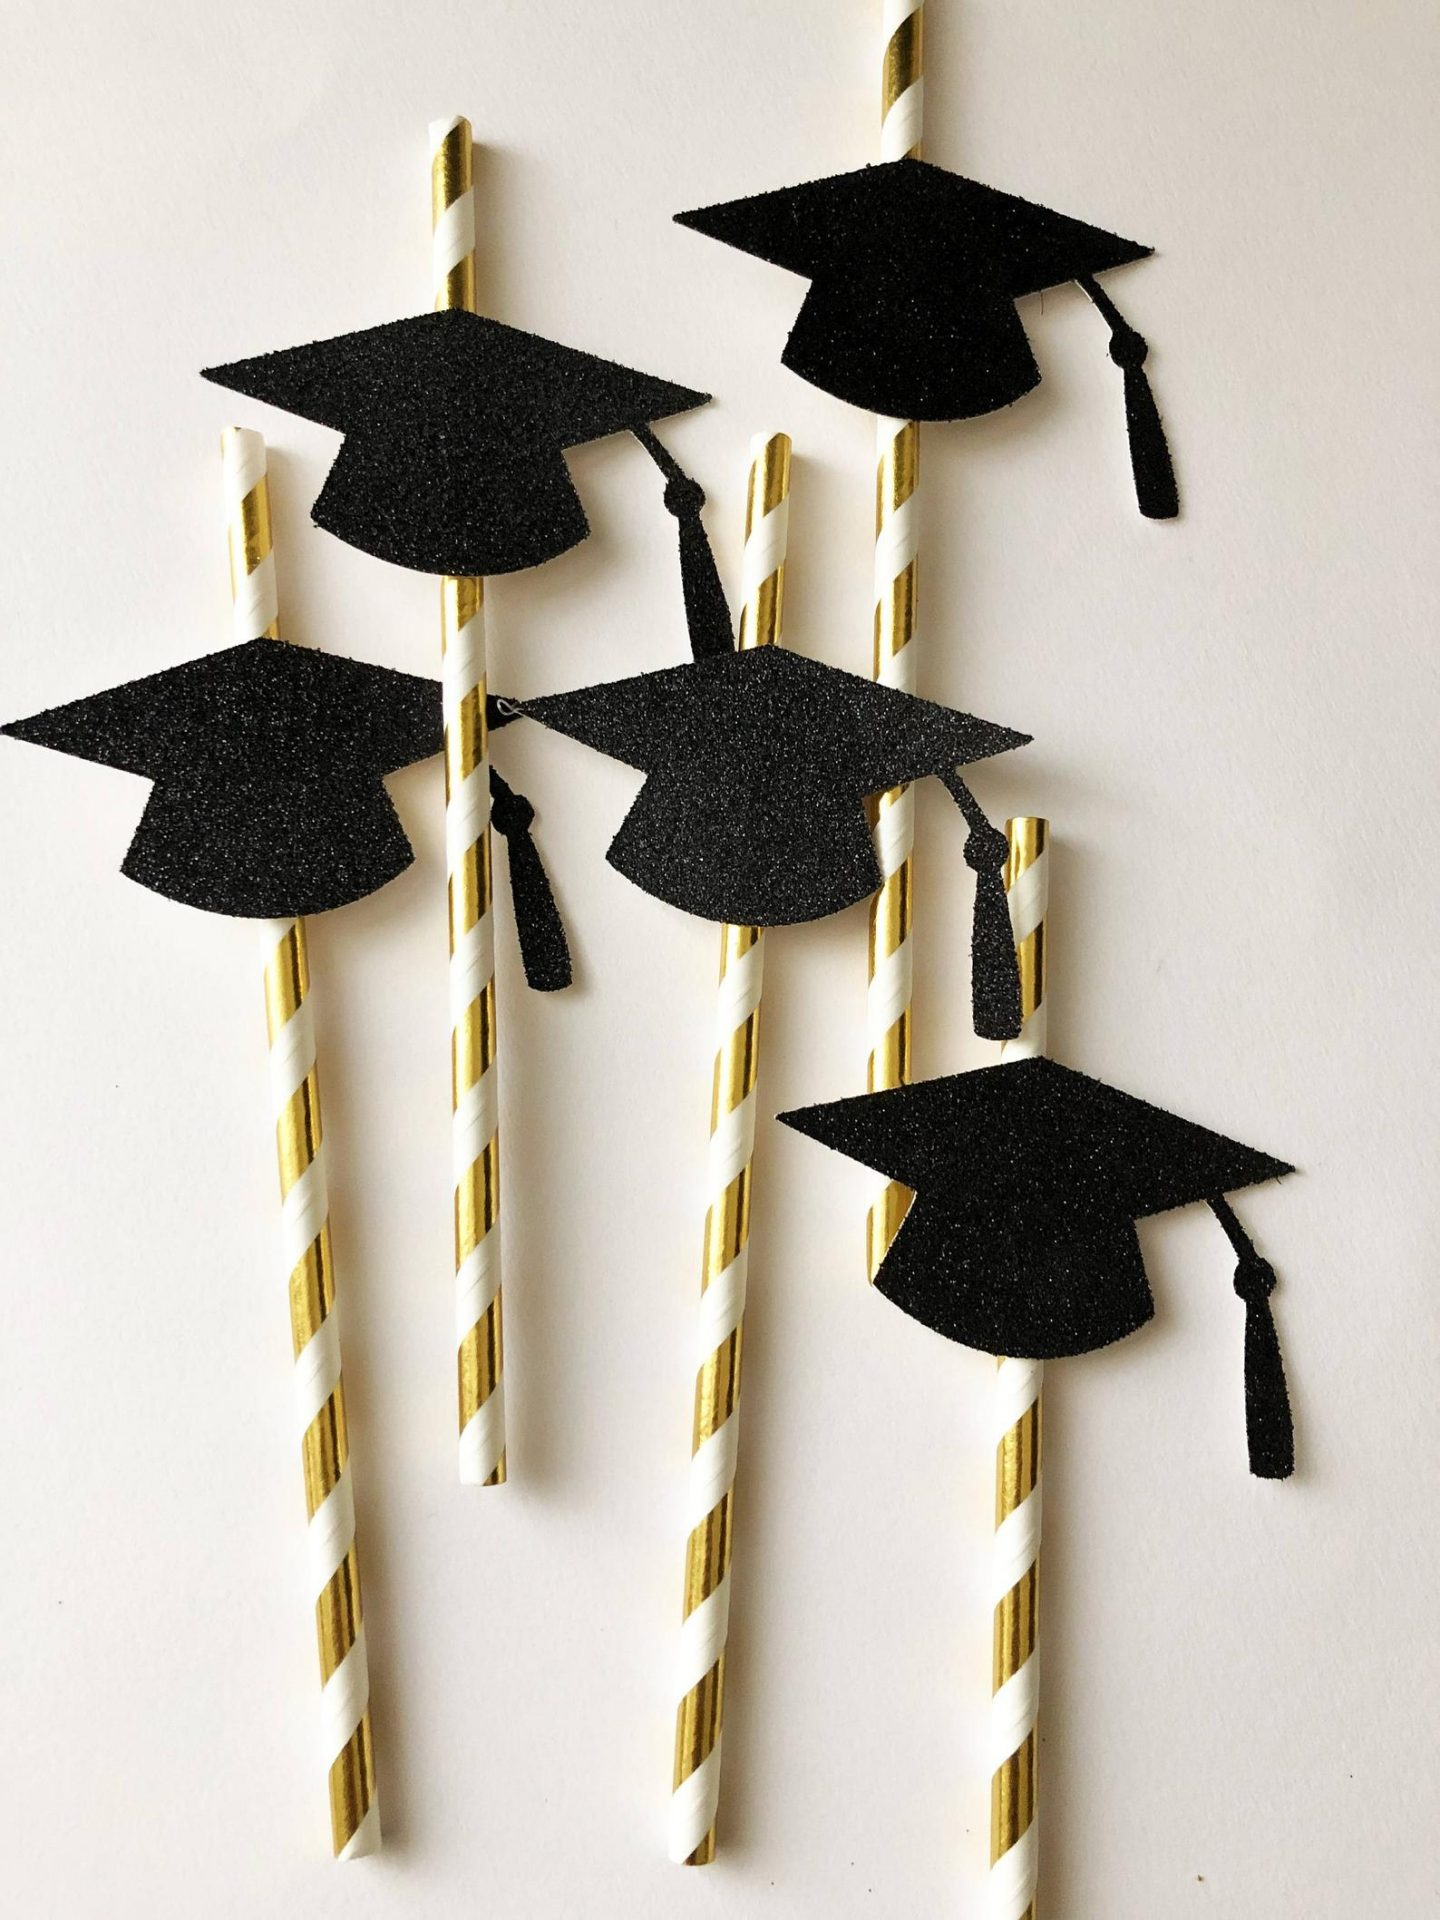 Graduation straws with cap